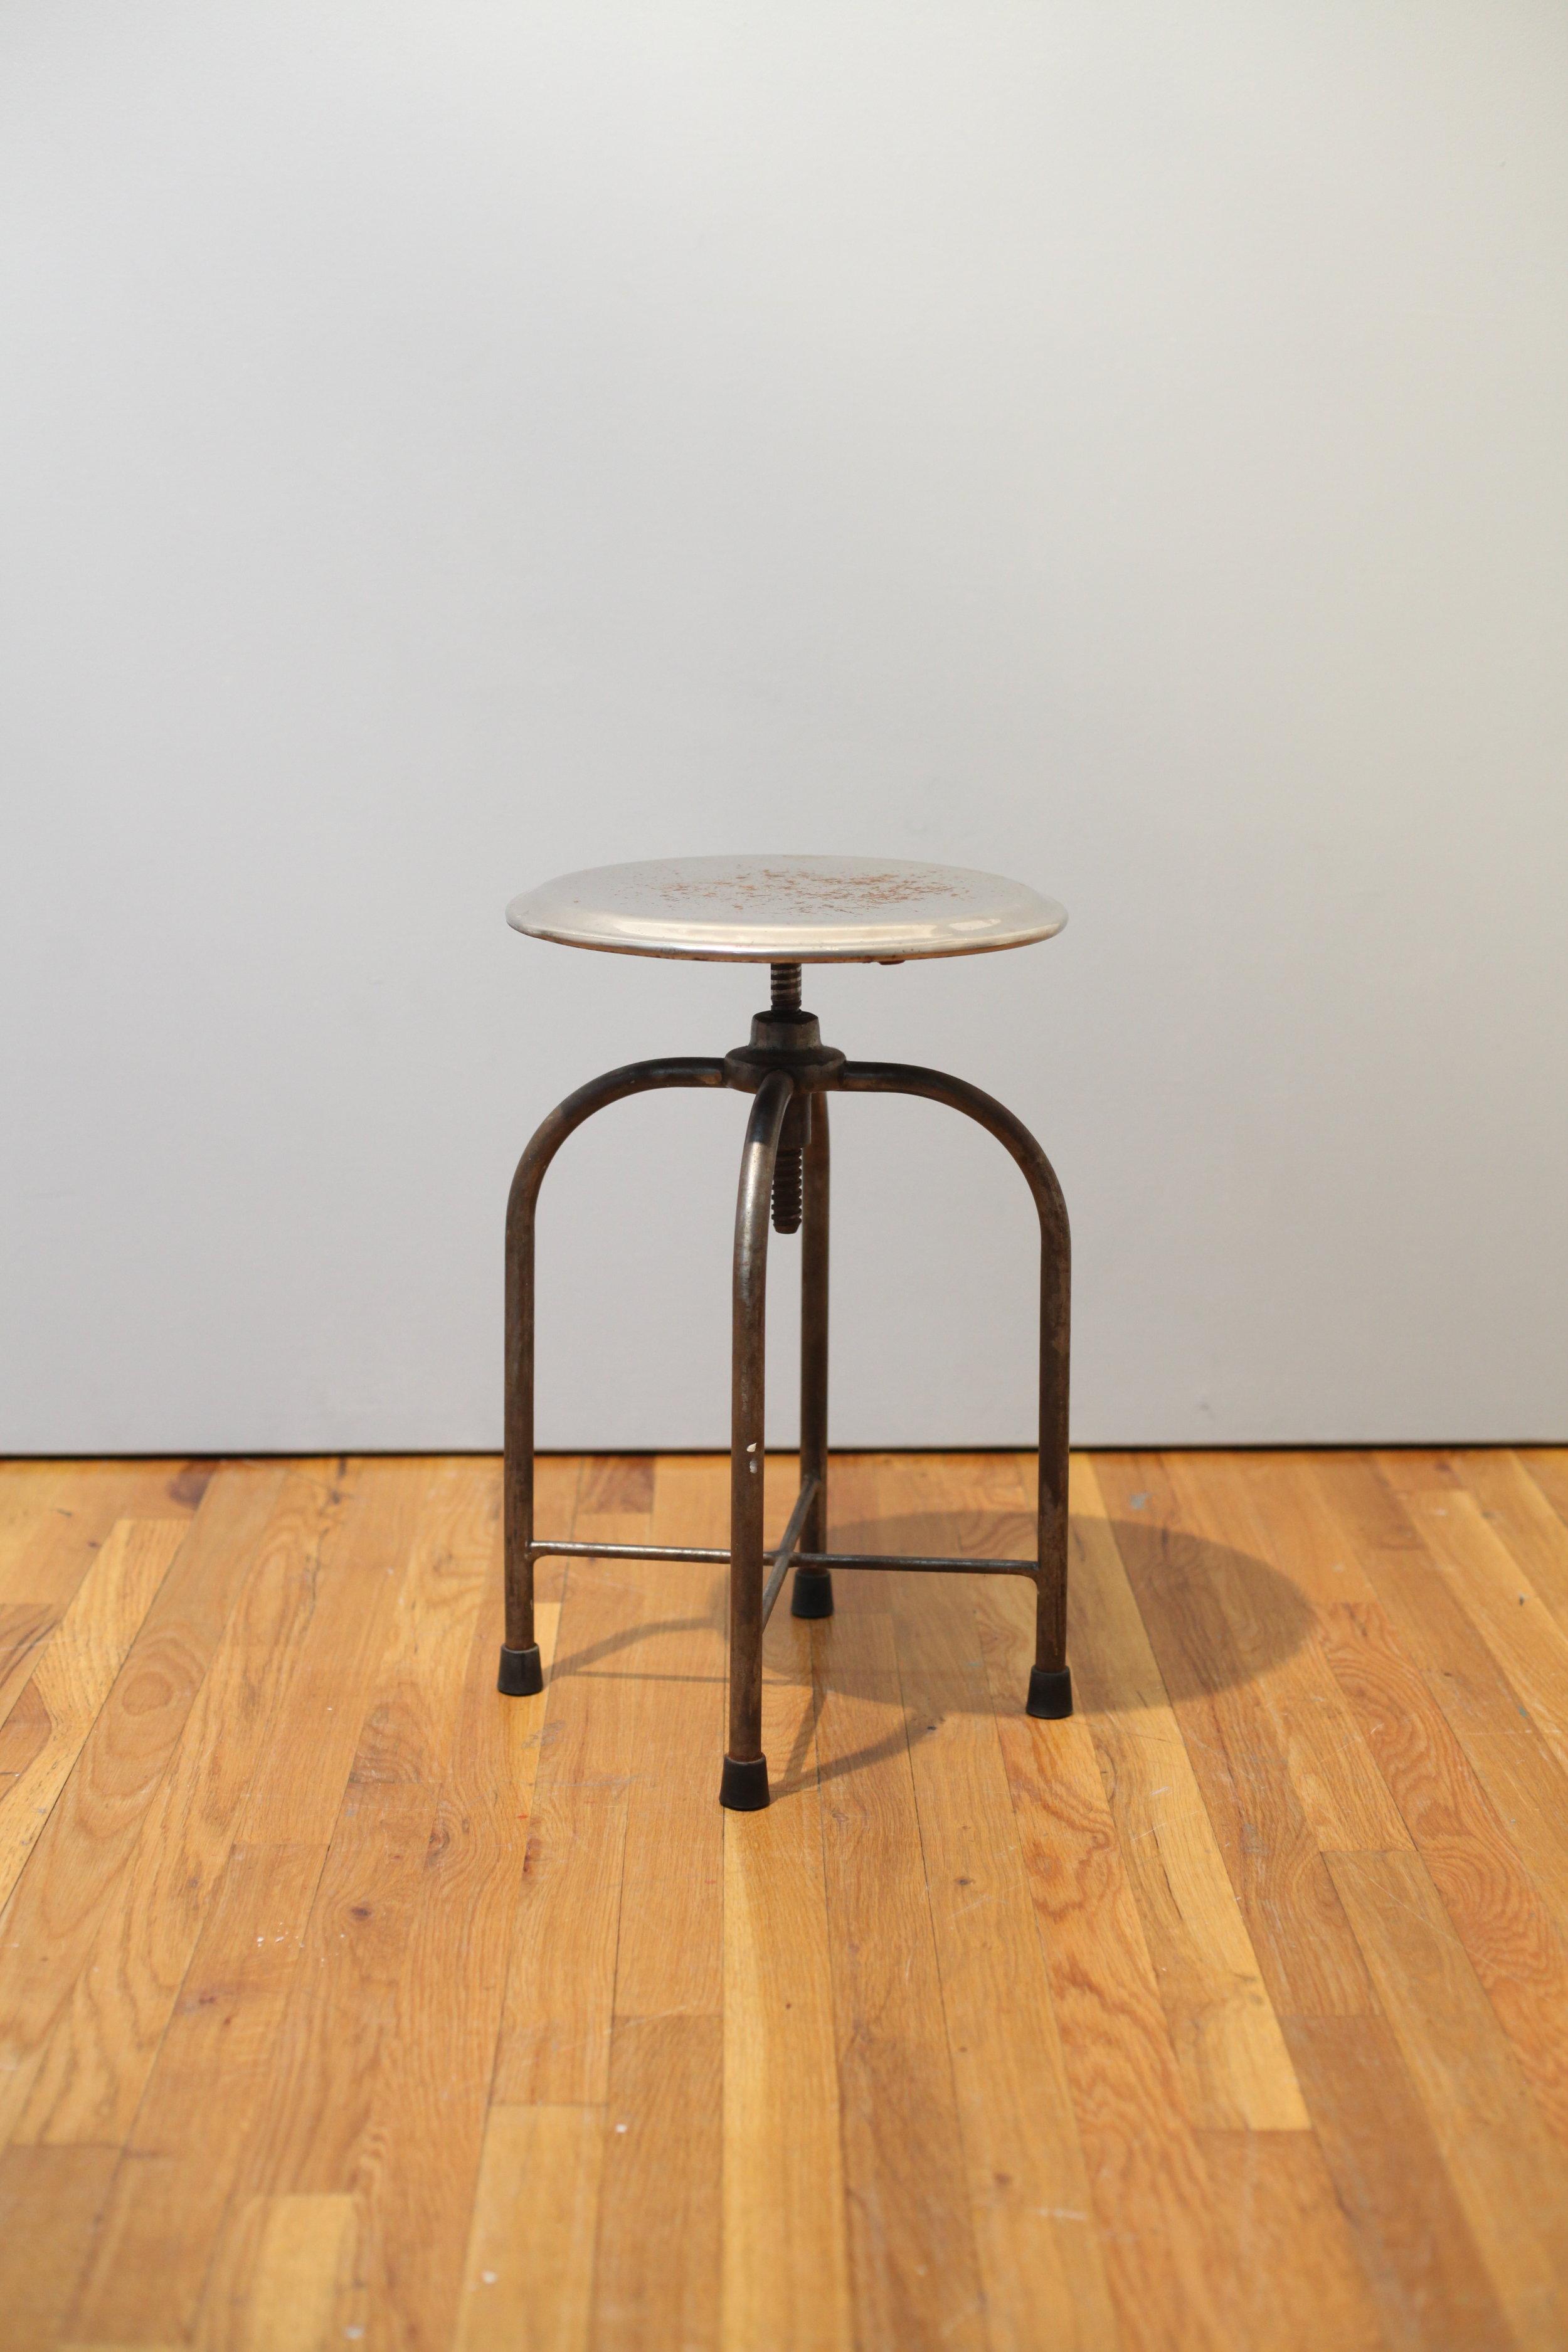 Machine Age Steel Swivel stool  $125